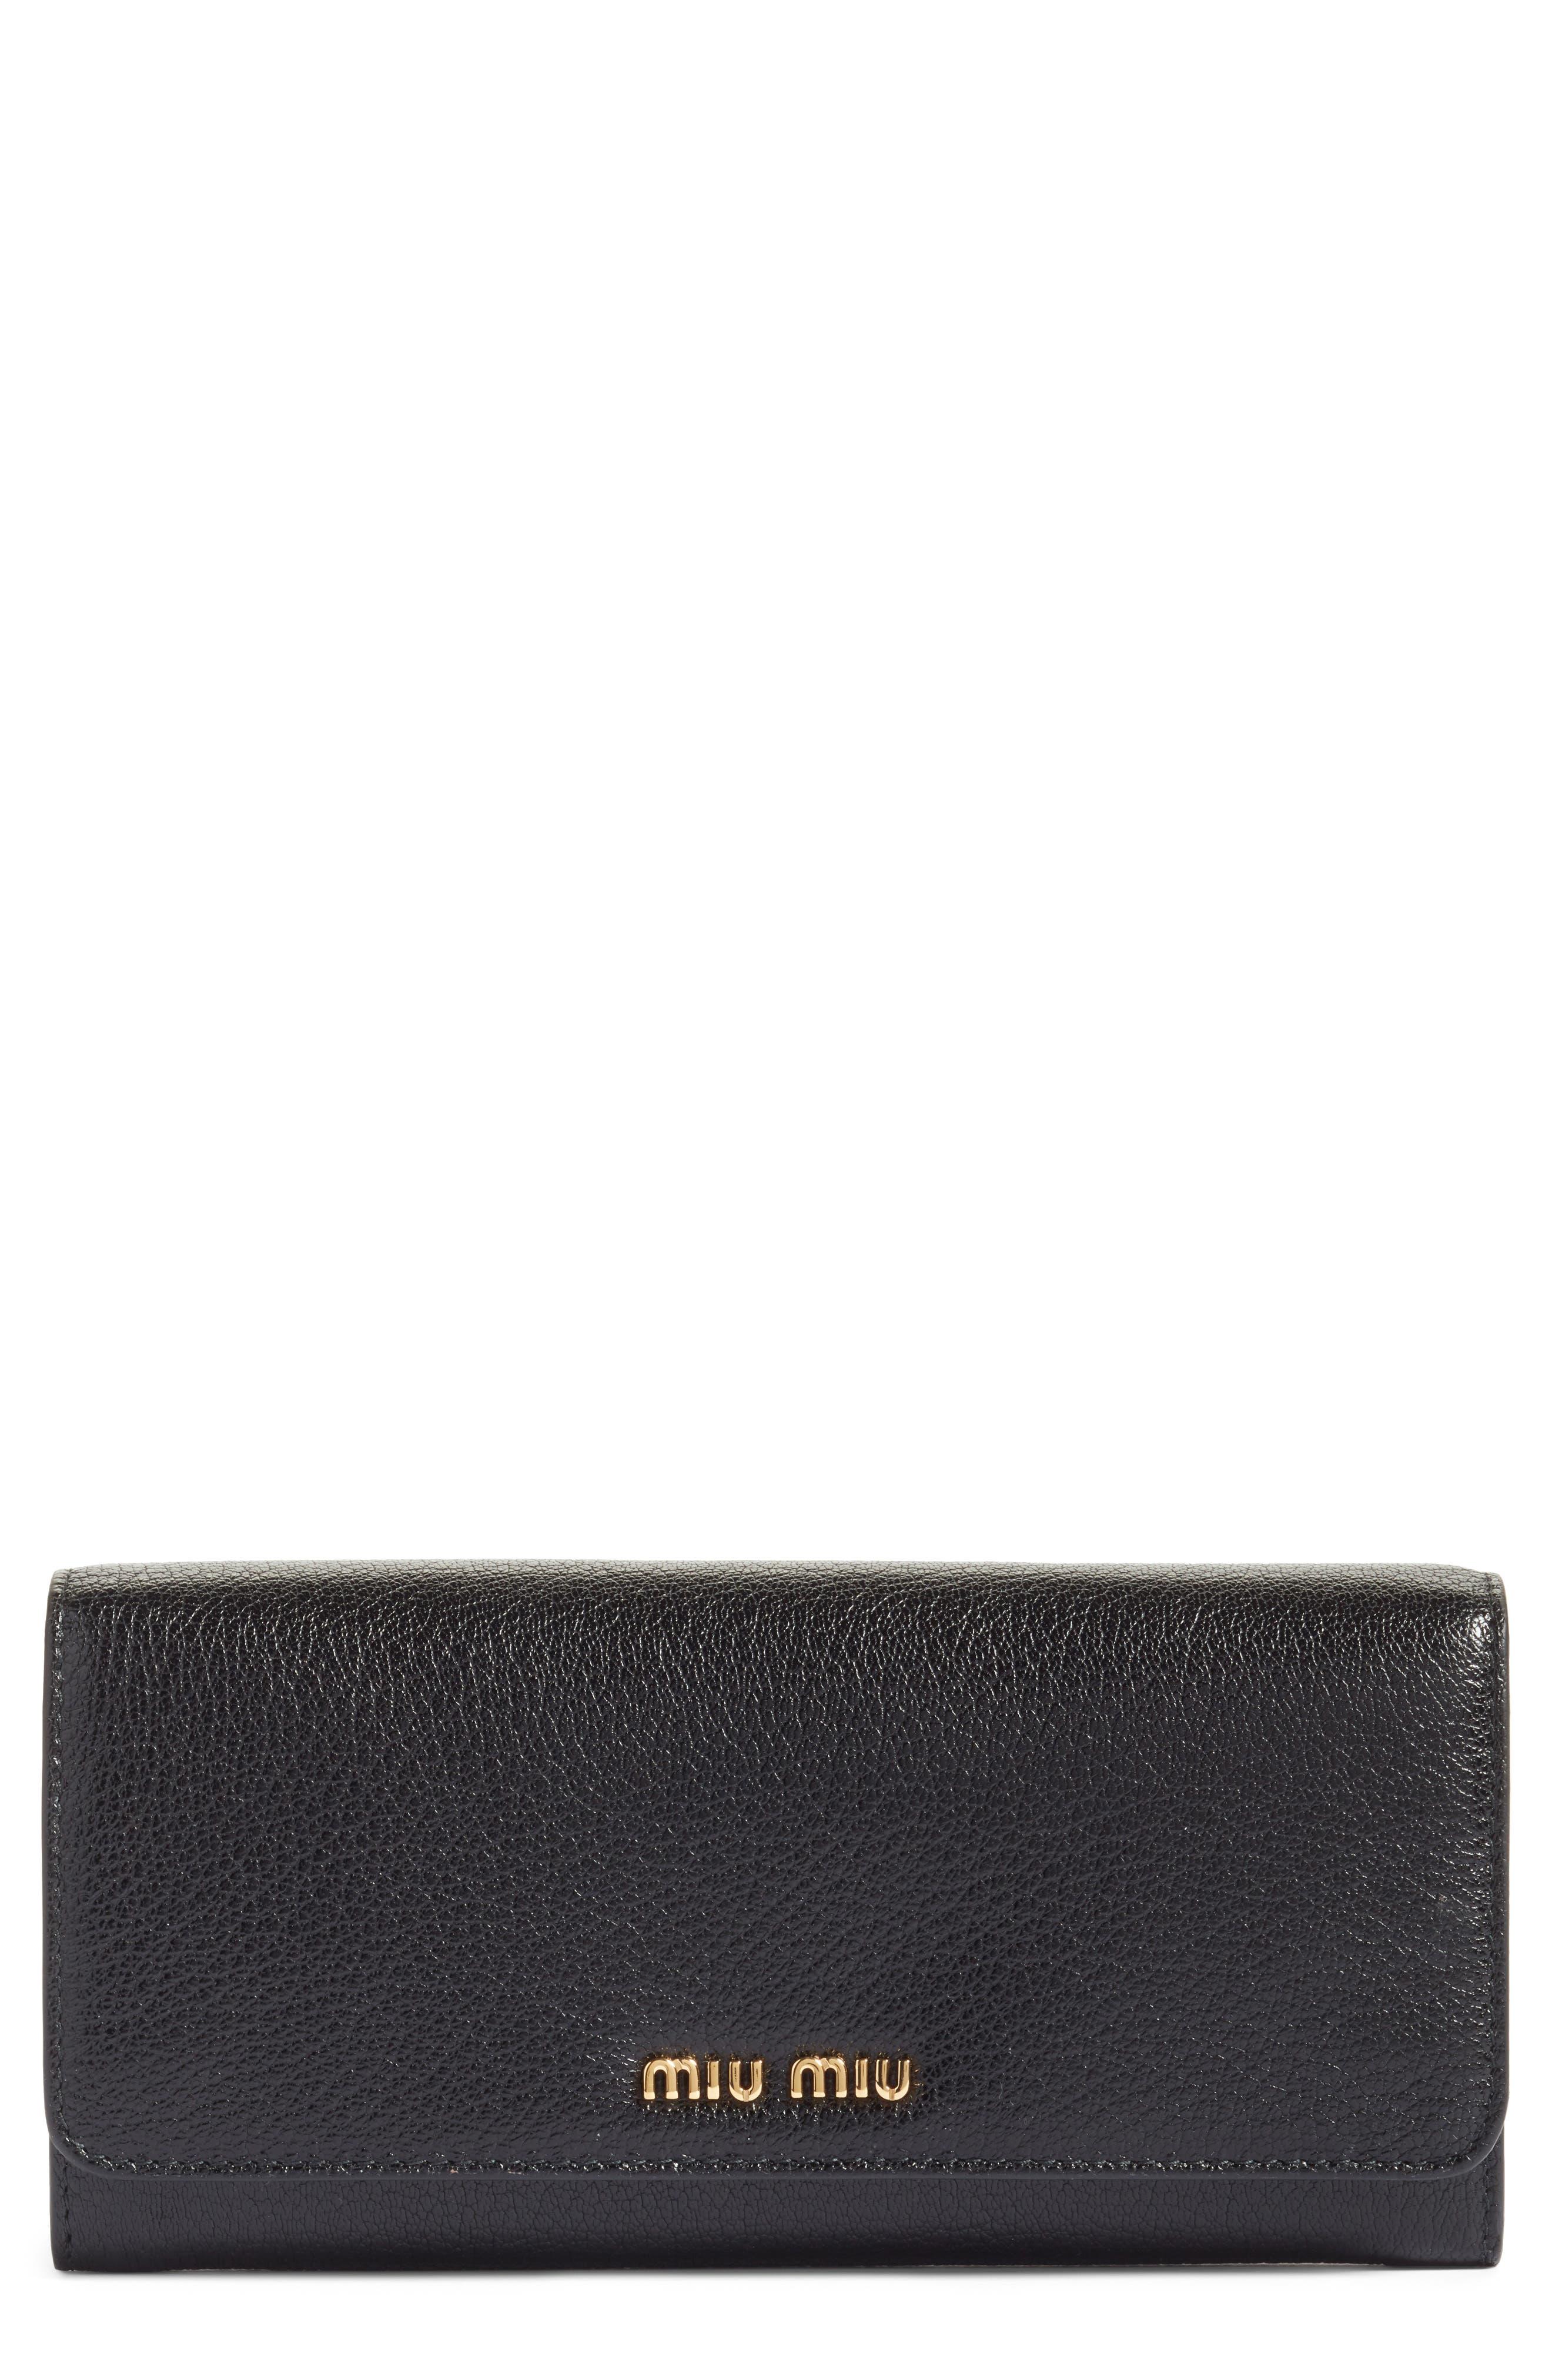 Main Image - Miu Miu Madras Leather Continental Wallet